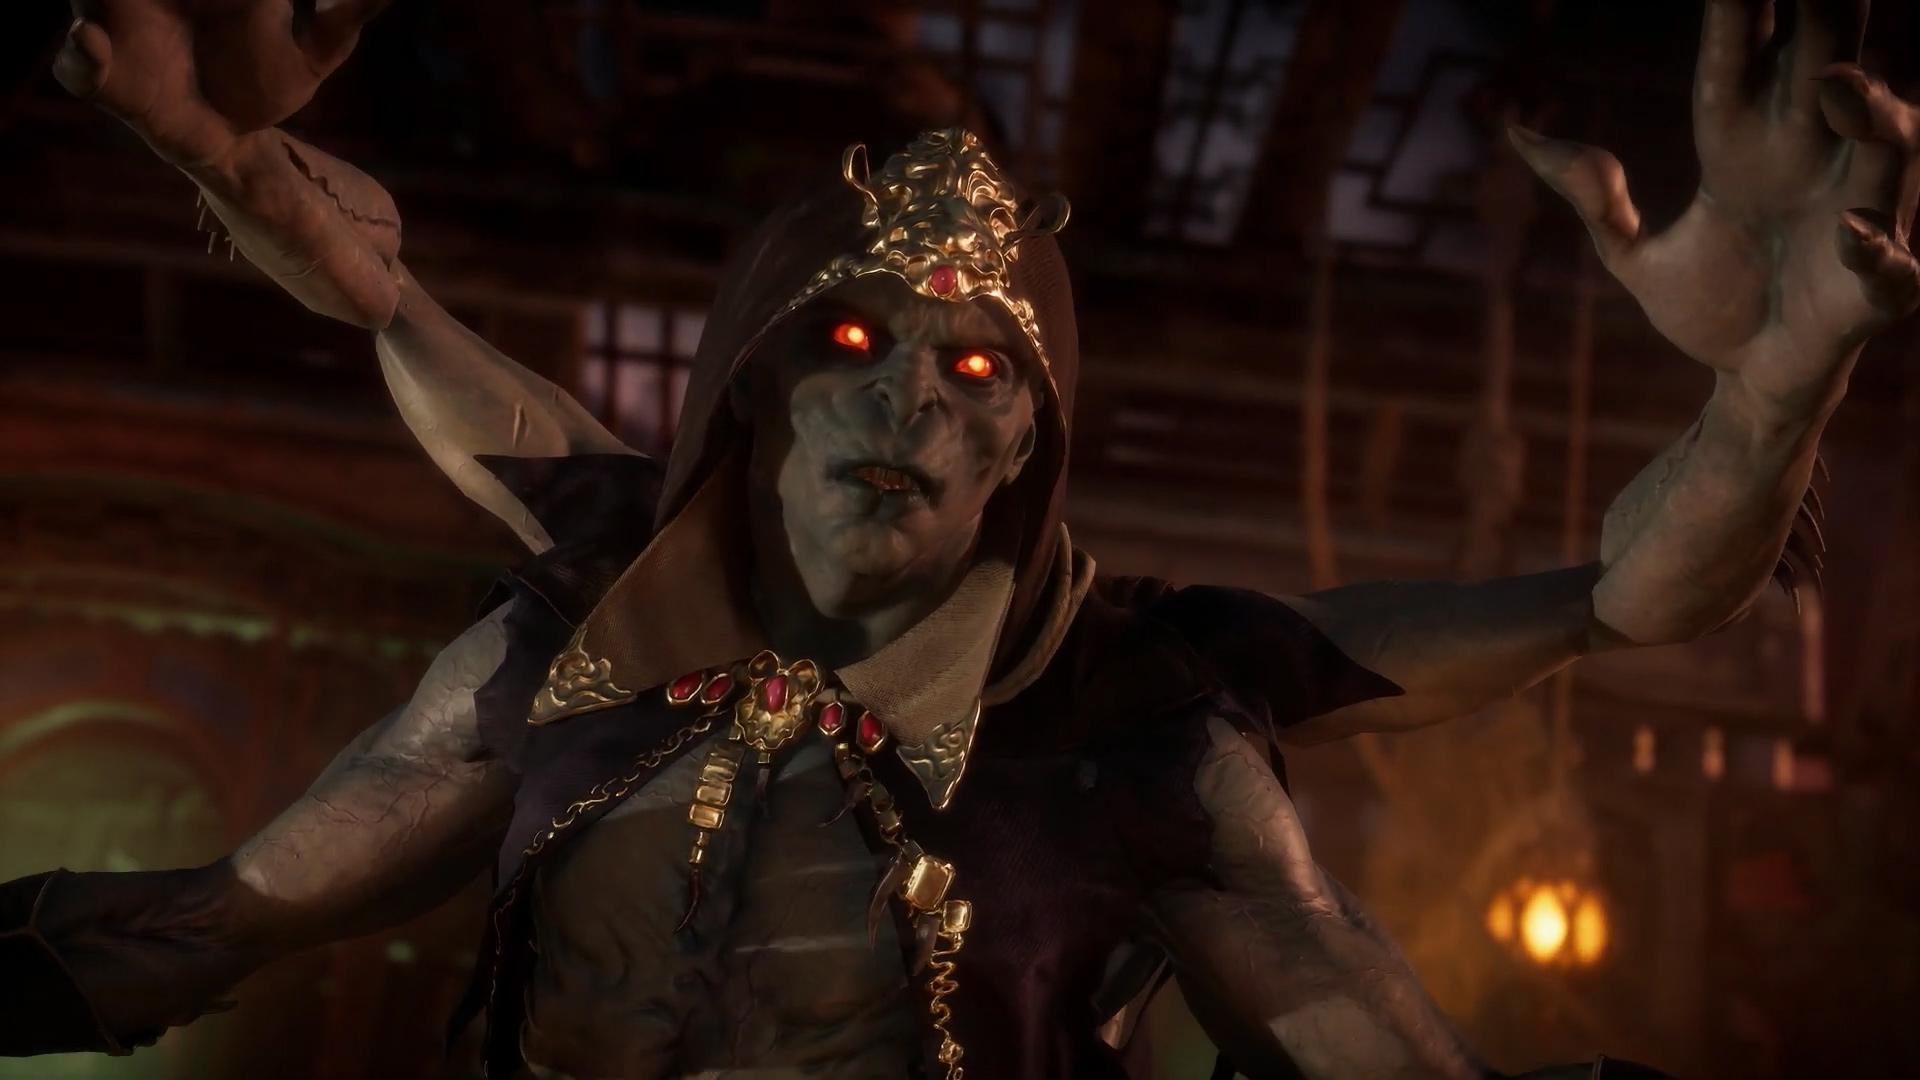 Mortal Kombat 11 has a new multi-armed goon named the Kollector screenshot